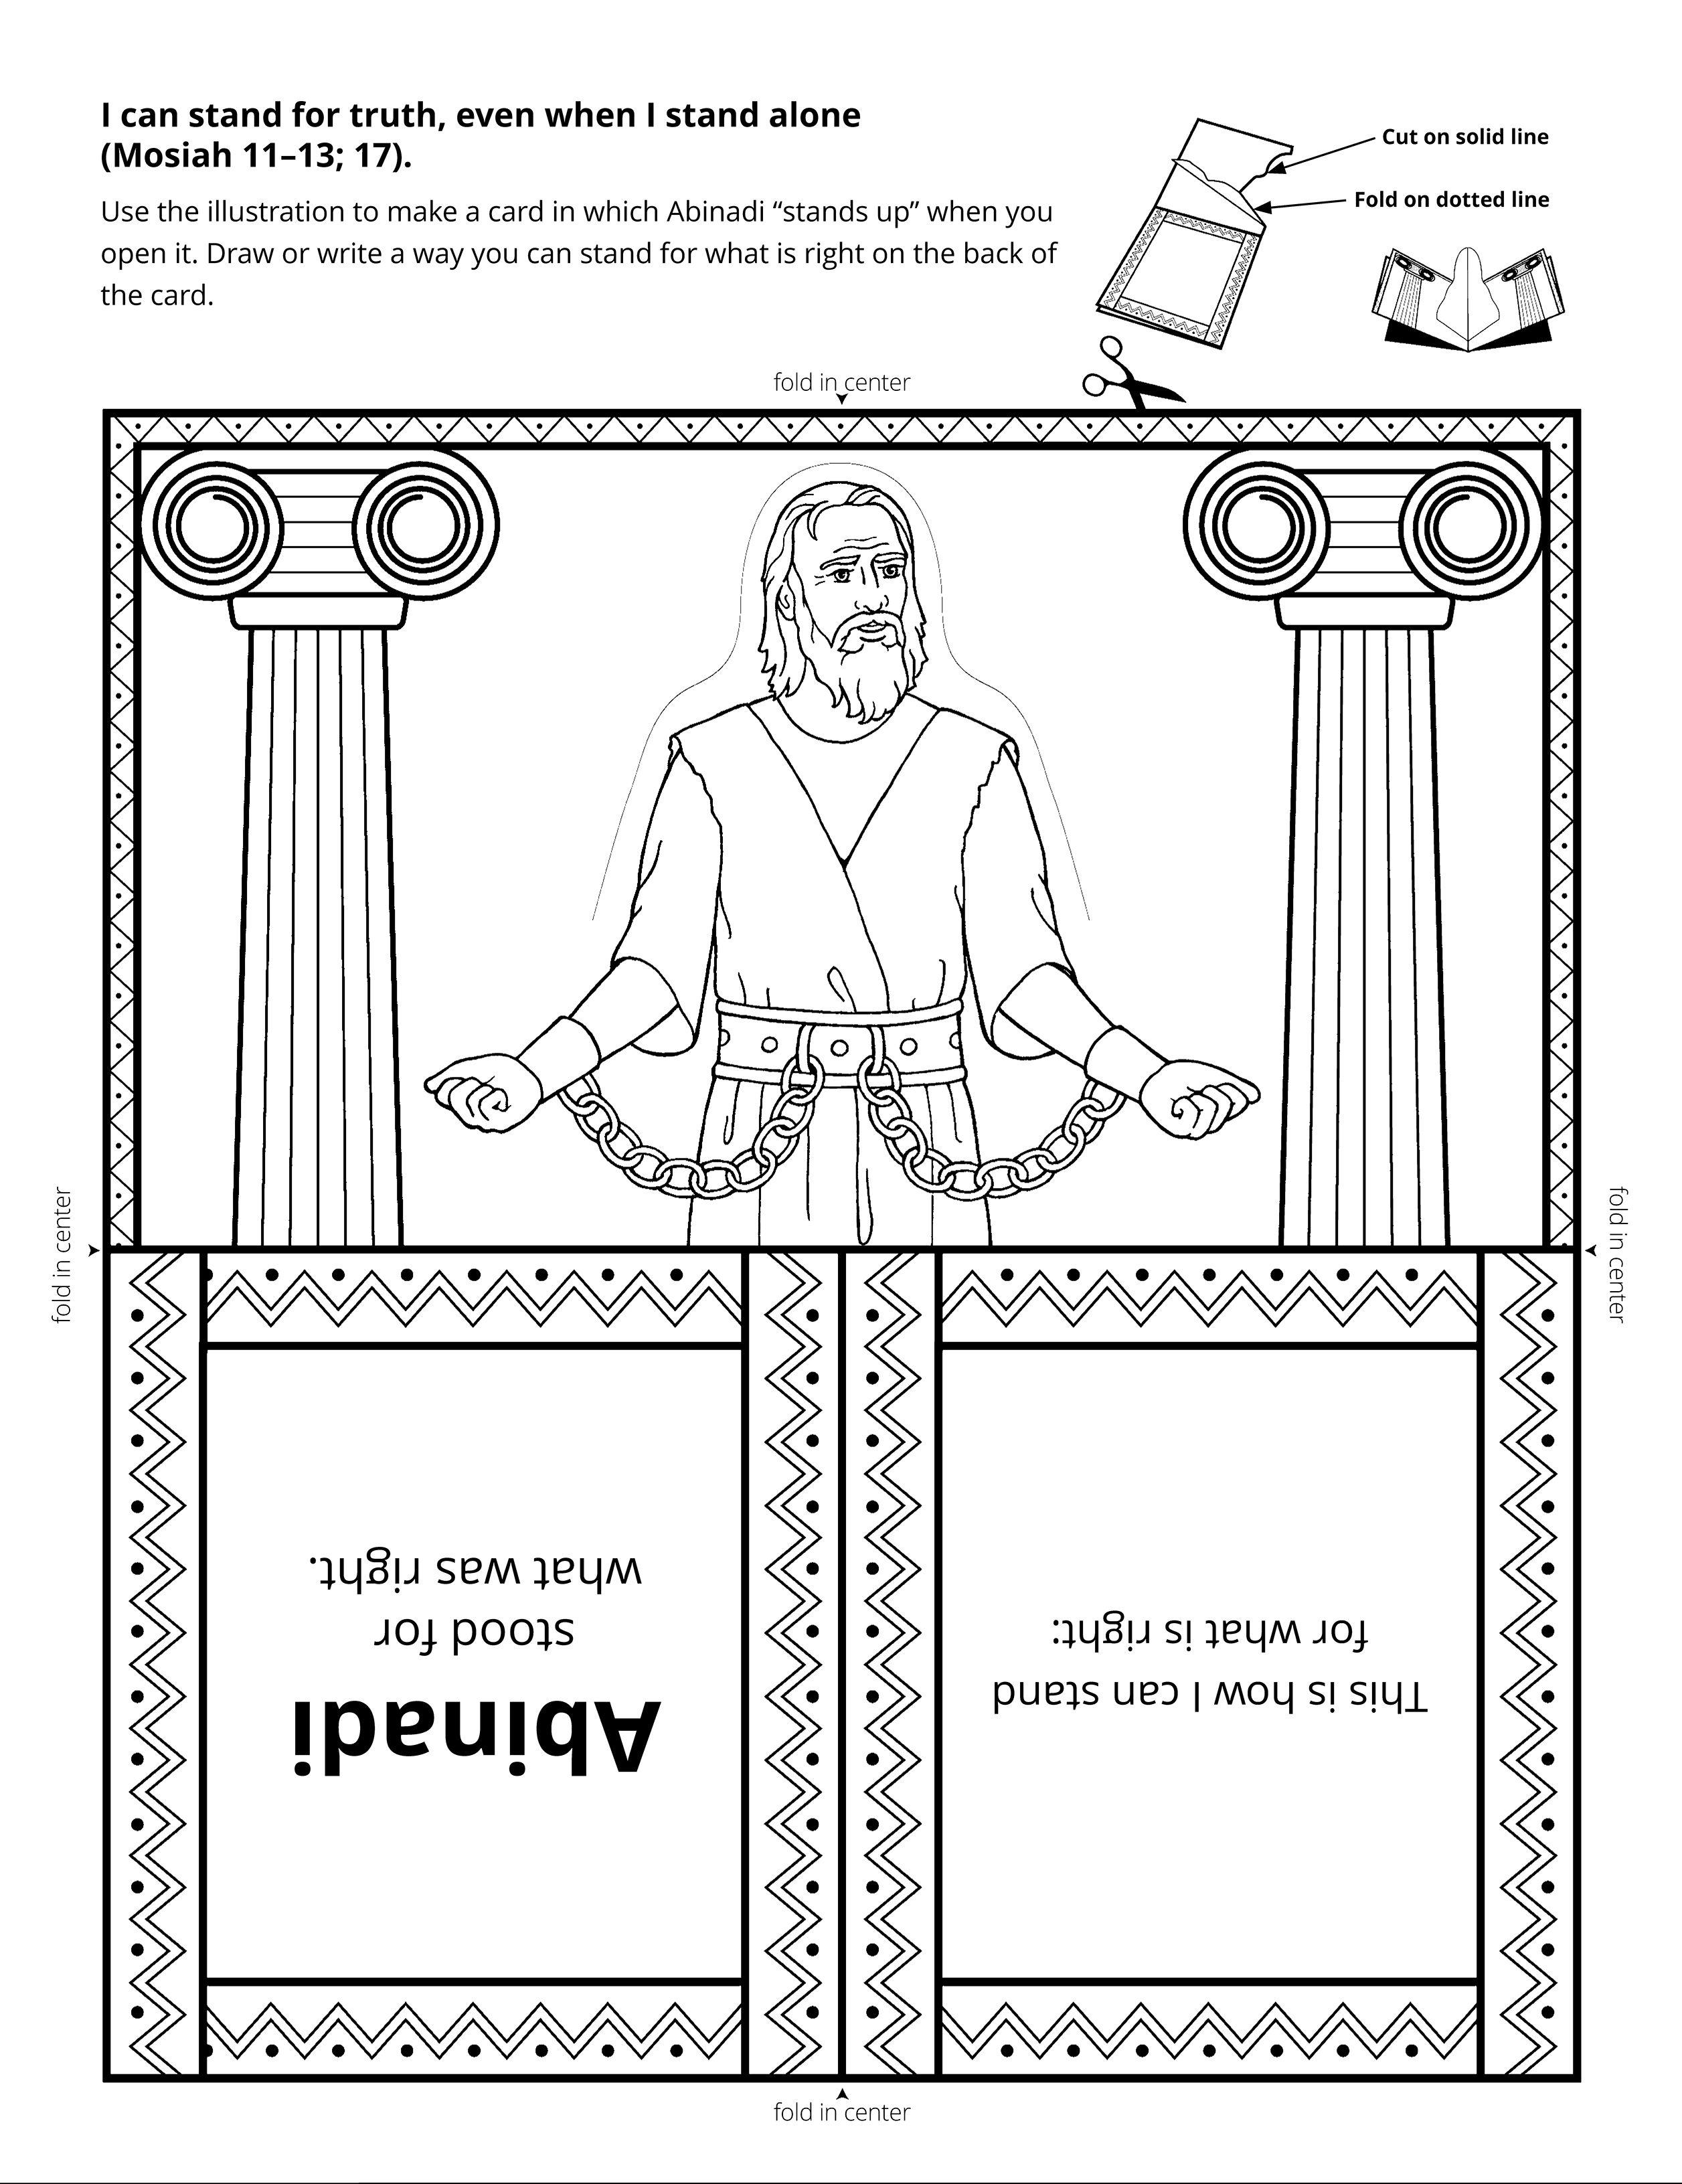 A line-art illustration of Abinadi.